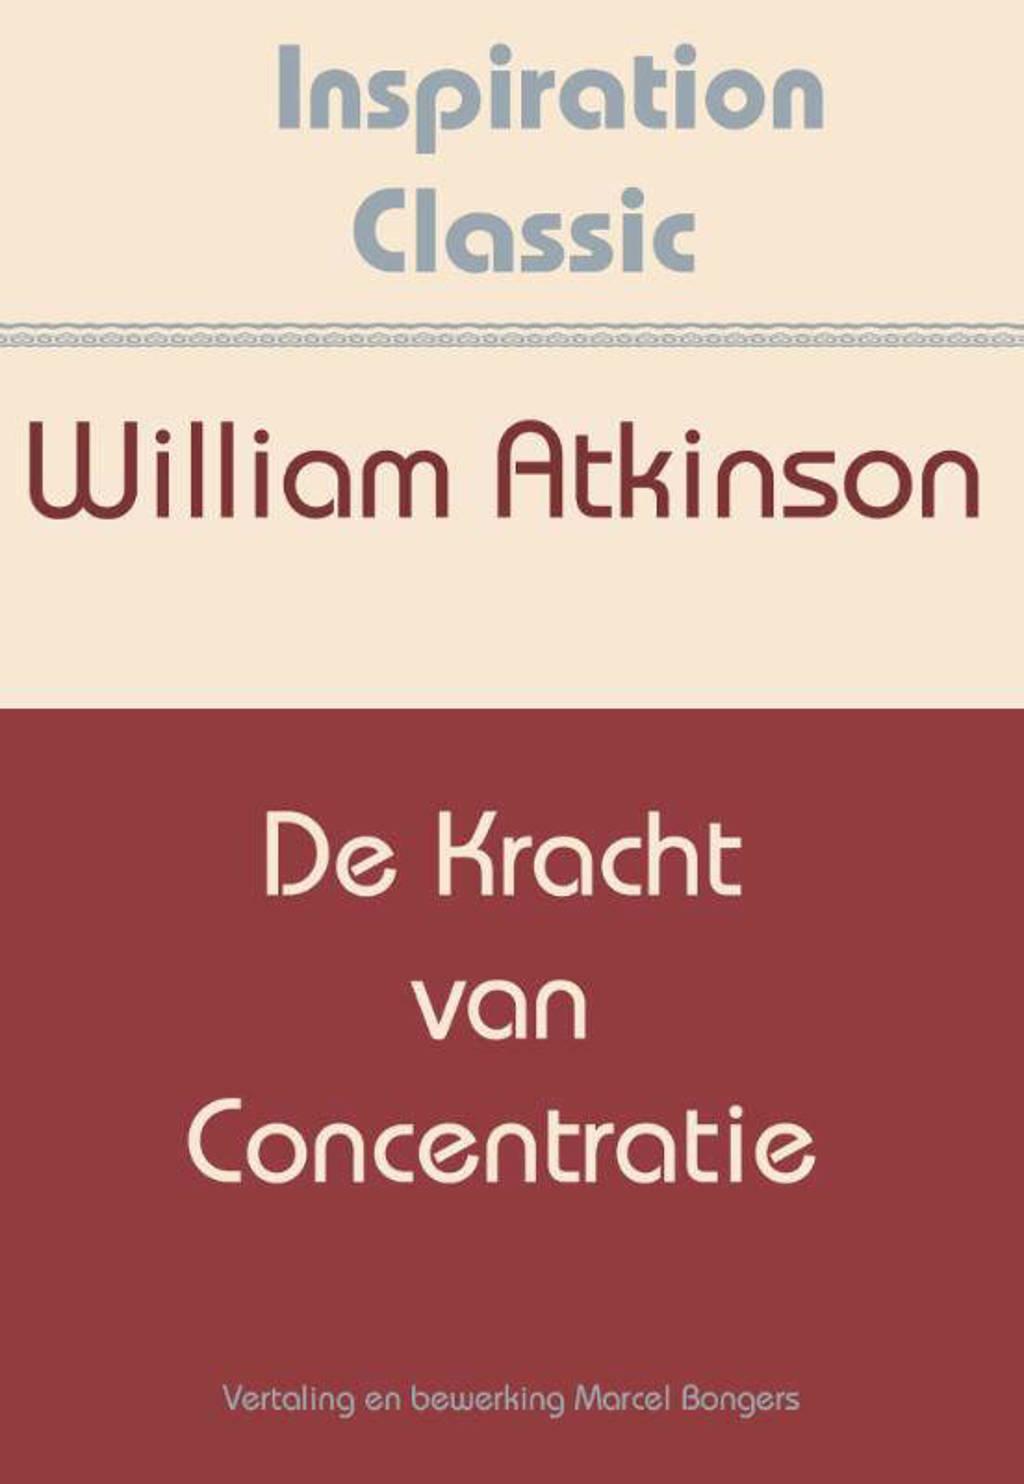 Inspiration Classic: De kracht van concentratie - William Atkinson